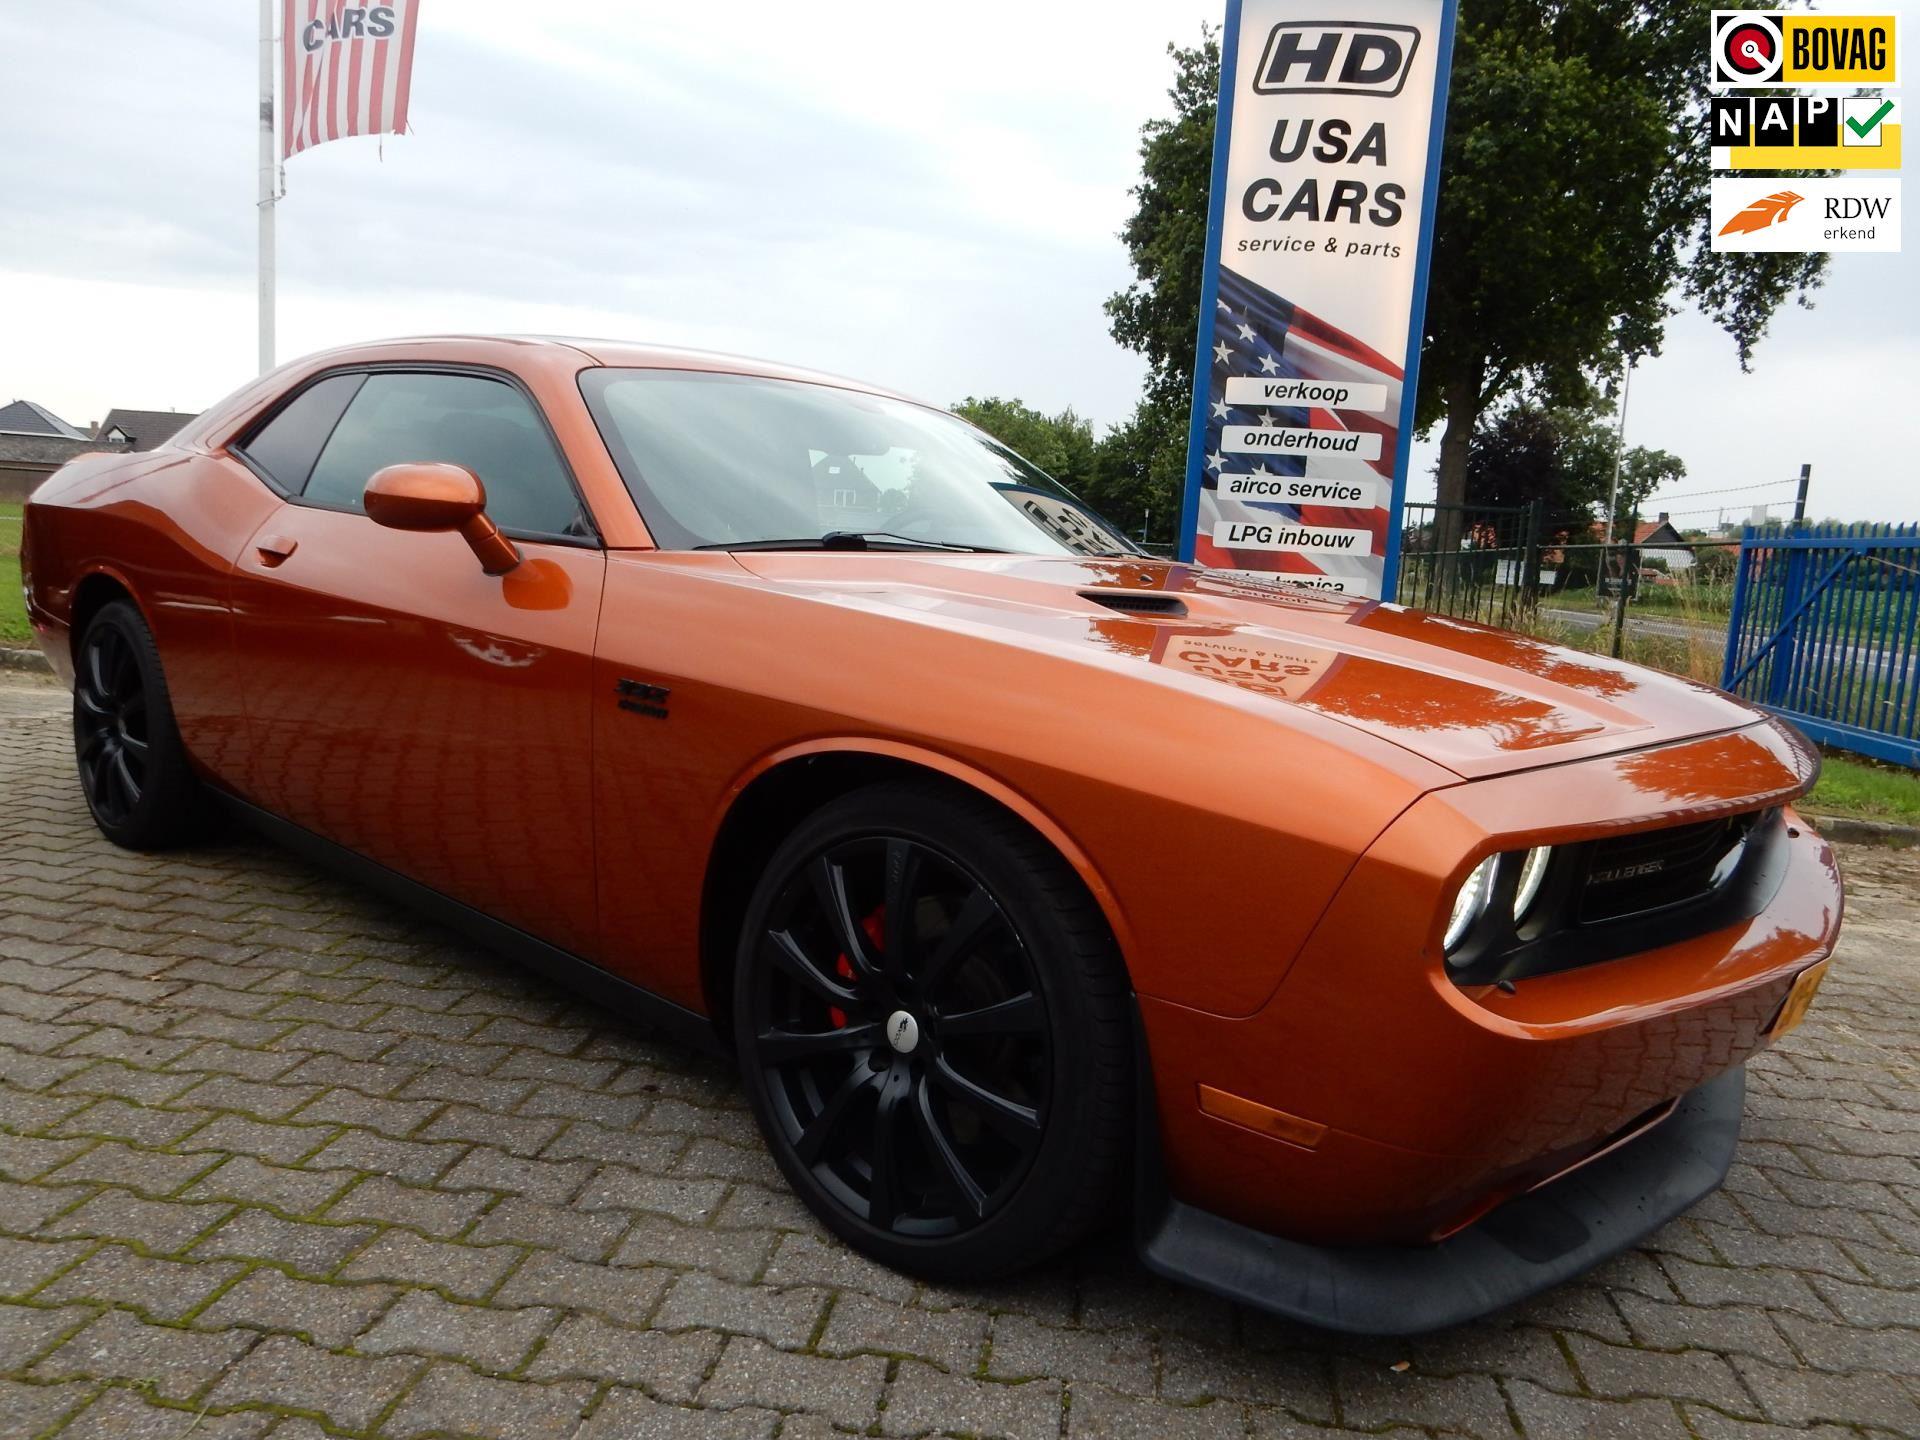 Dodge CHALLENGER SRT occasion - HD USA CARS